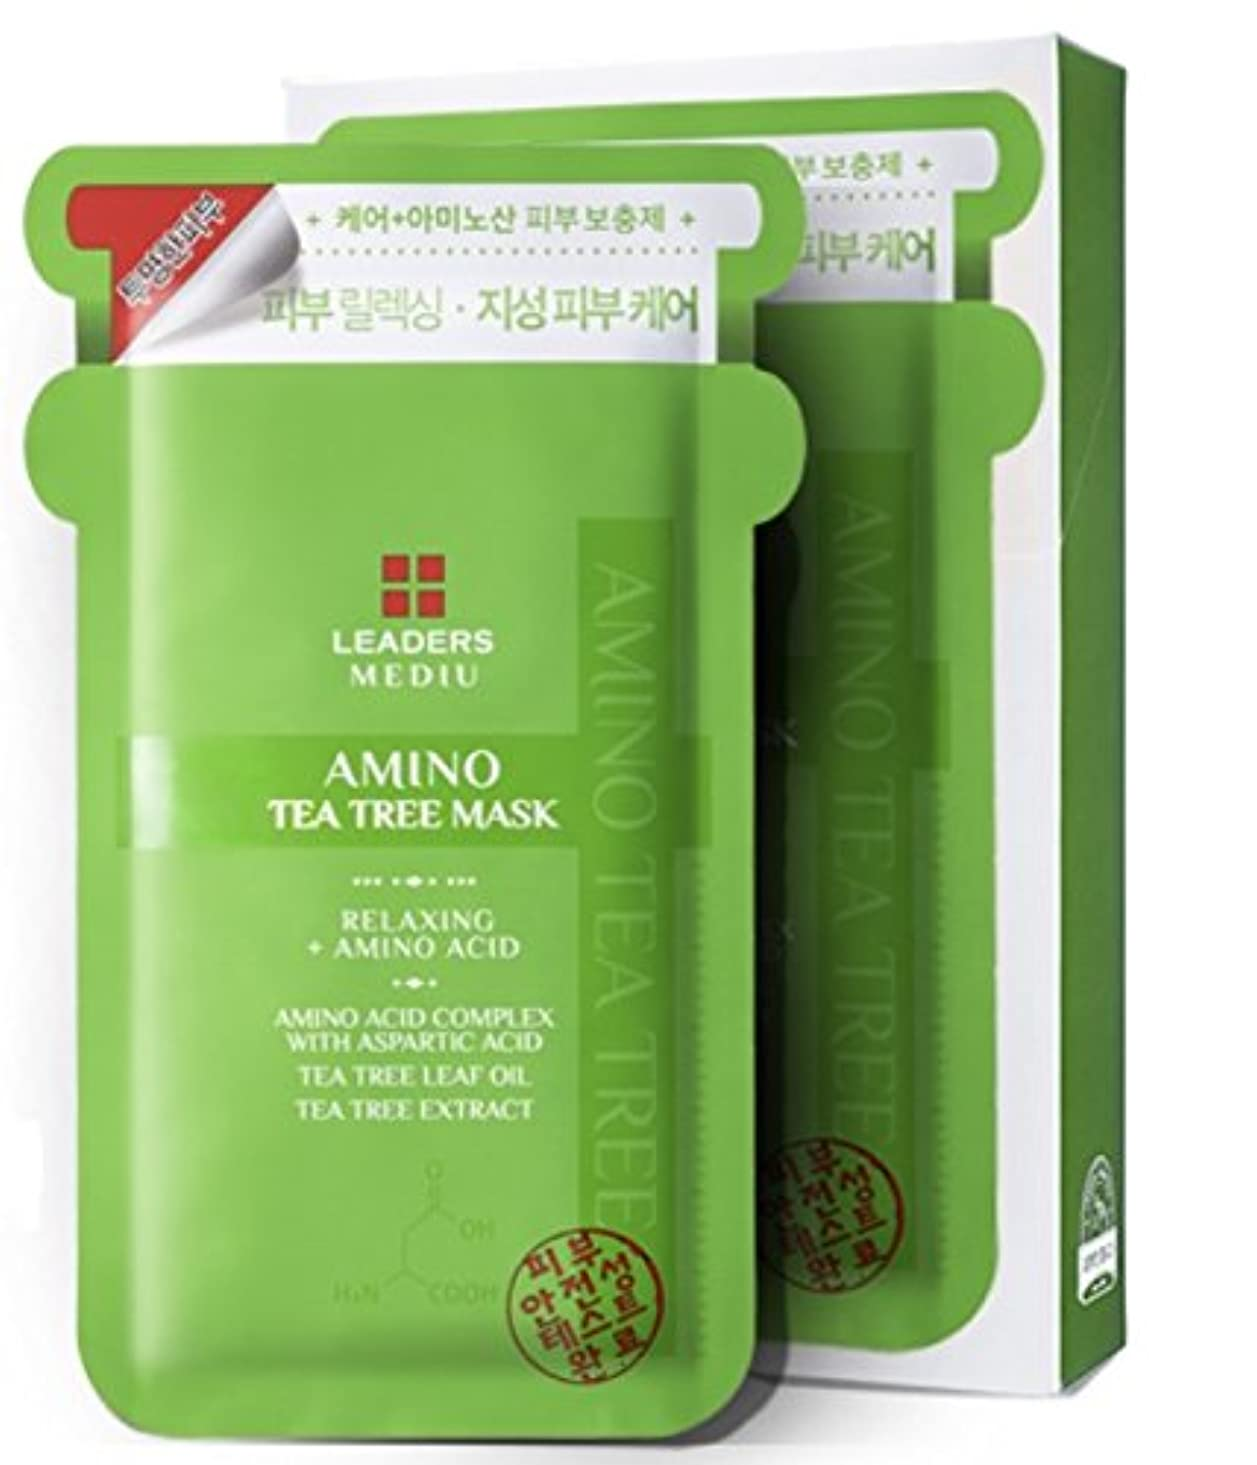 [LEADERS] リーダーズメディ有アミノティーツリーマスク 25ml x10枚 (LEADERS MEDIU Amino Tea Tree Mask 25mlx10ea) [海外直送品]